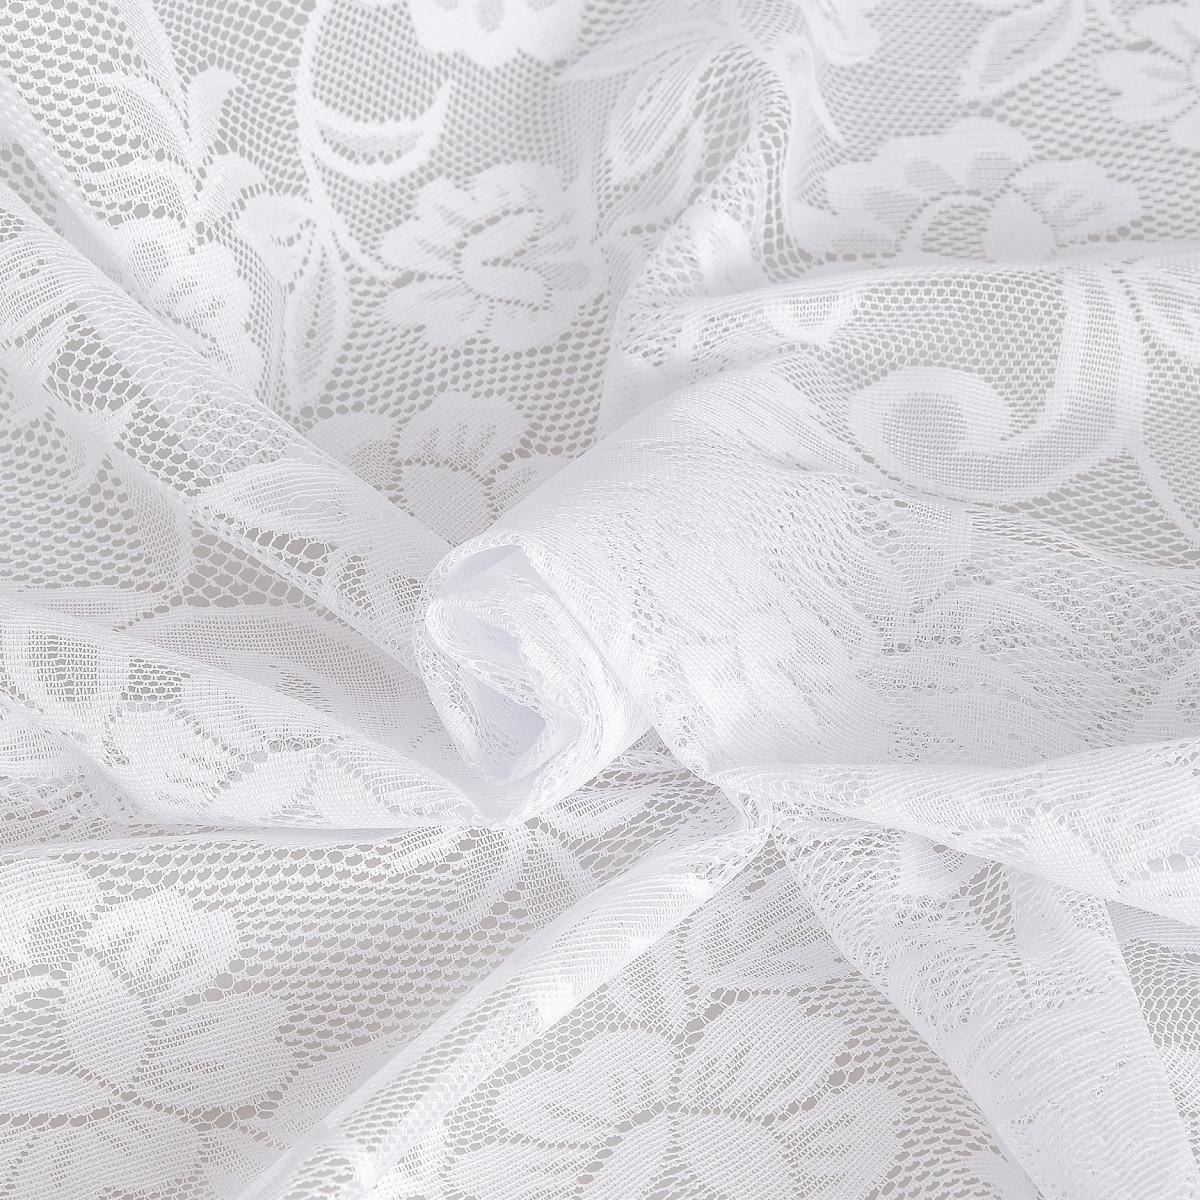 Тюль 1 м/п Арка ажурная сетка 170 см цвет белый